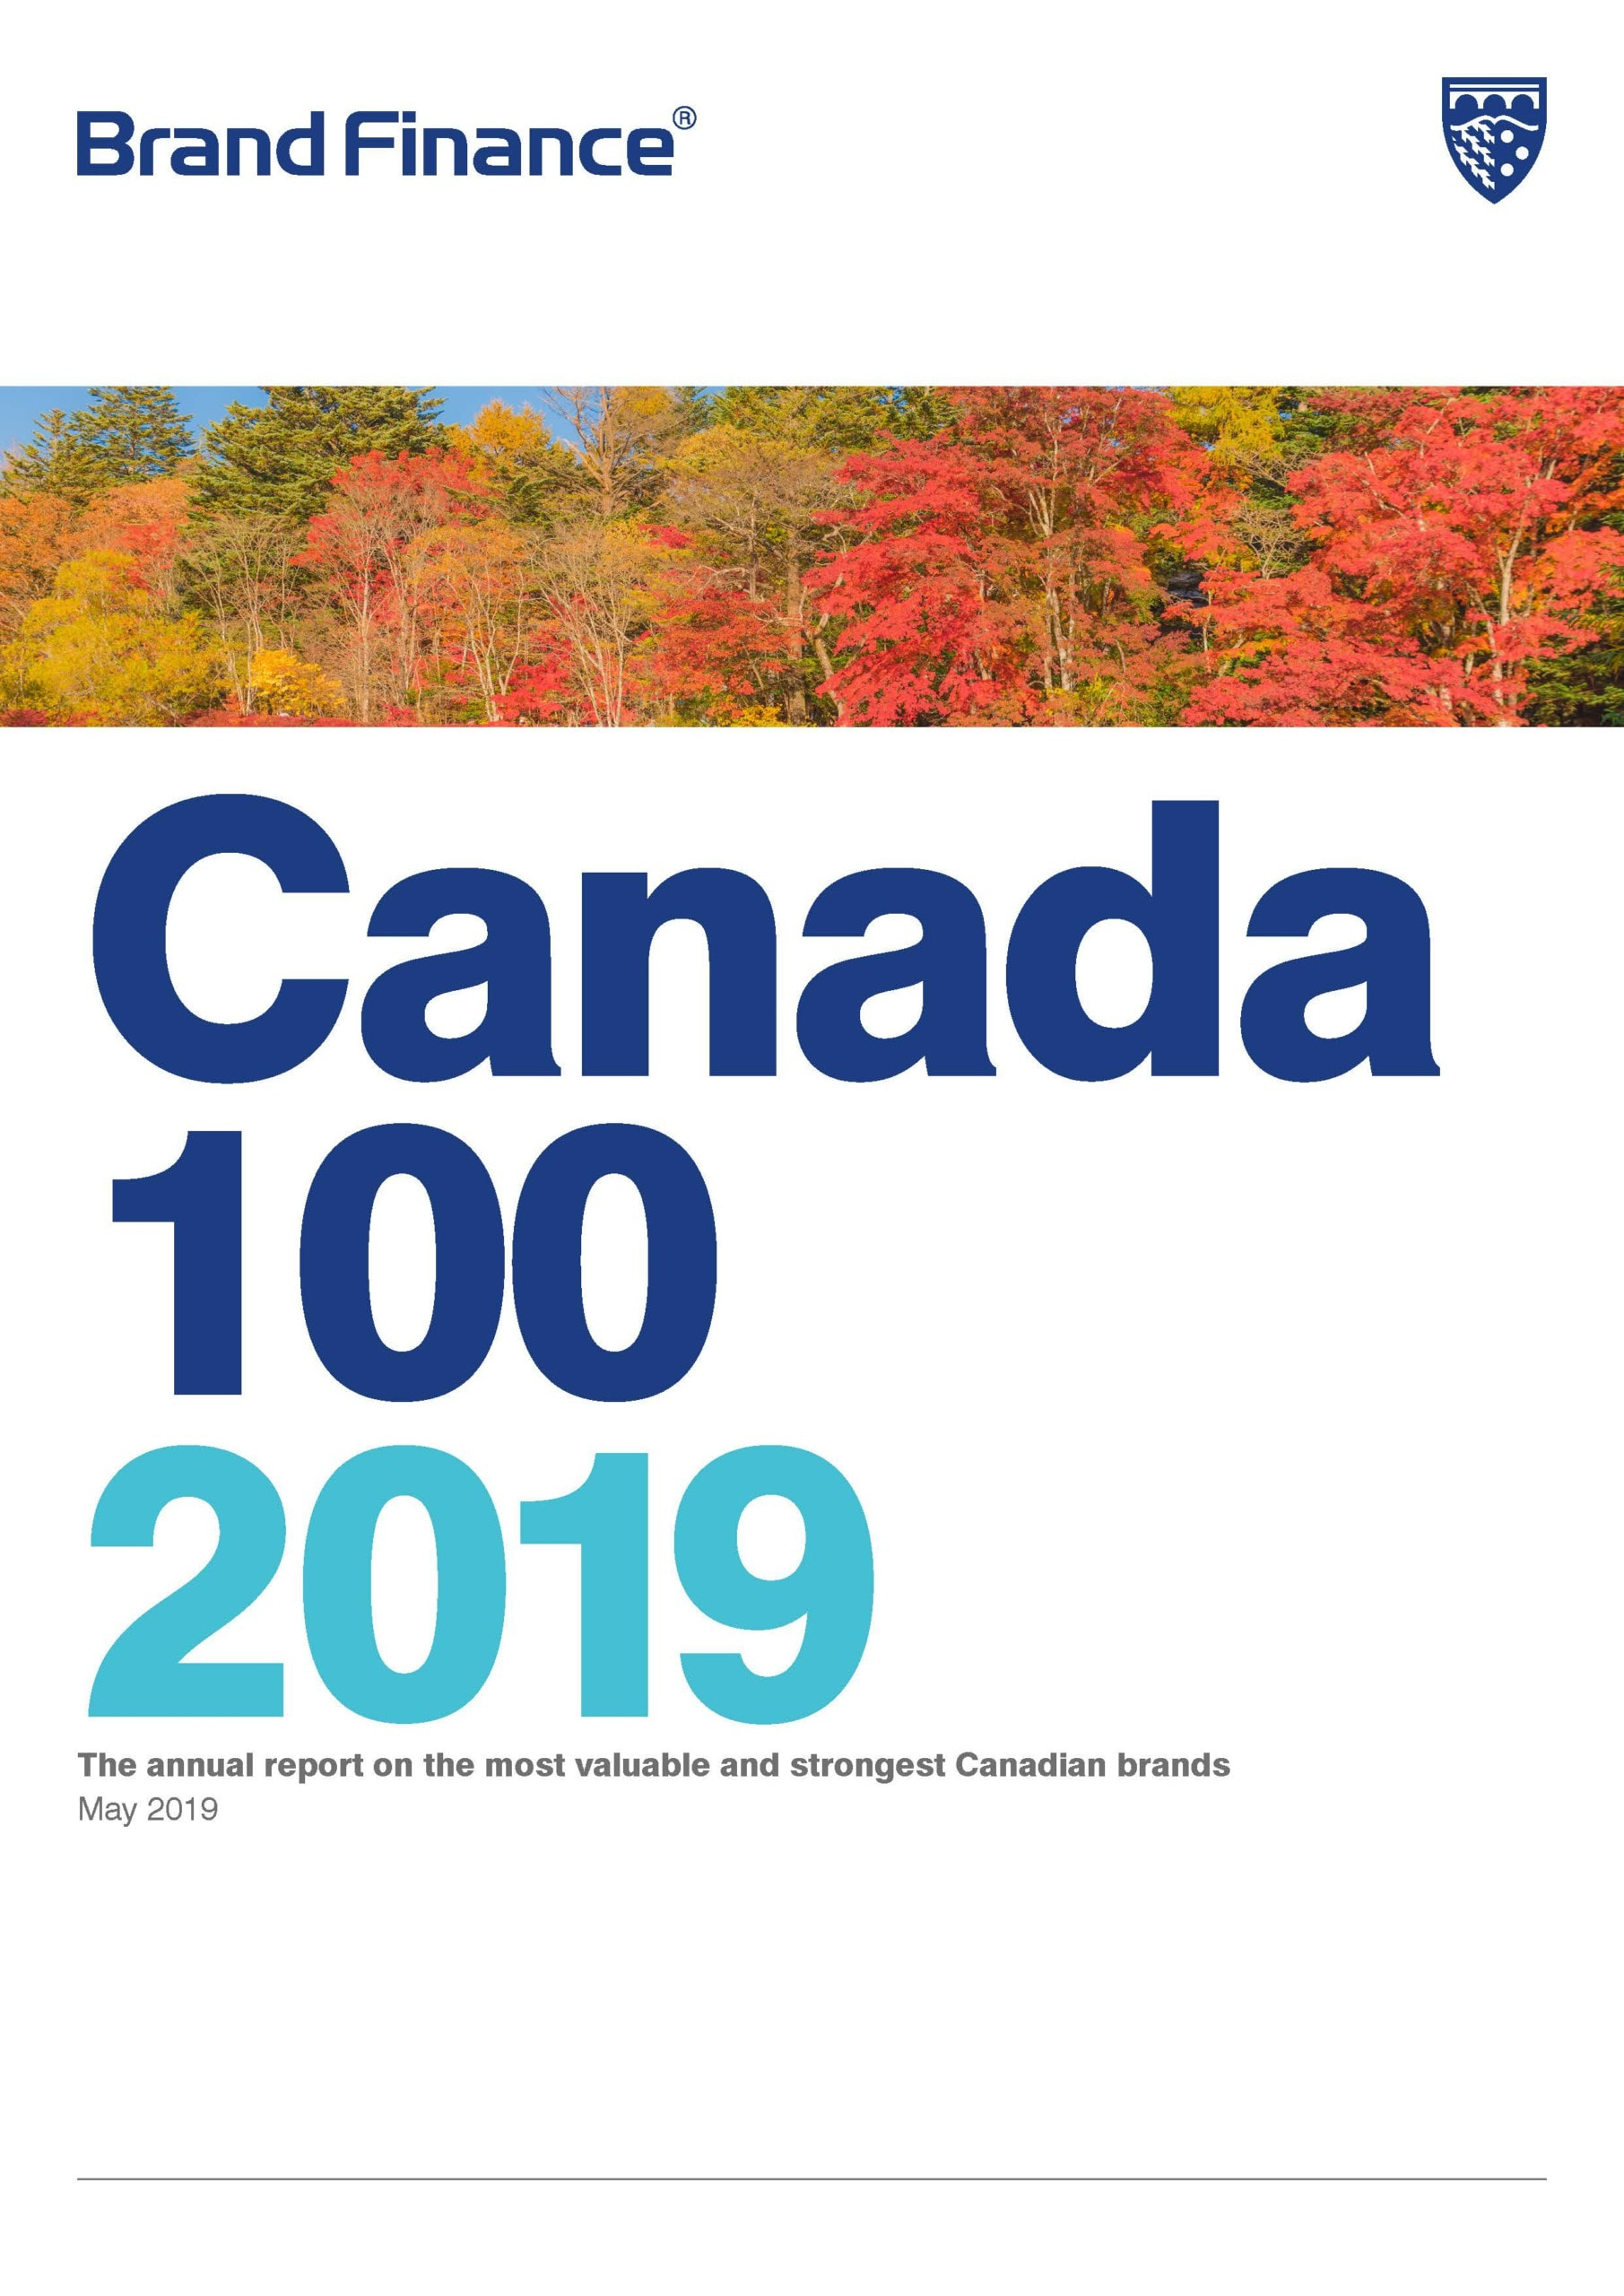 Brand Finance Canada 100 2019